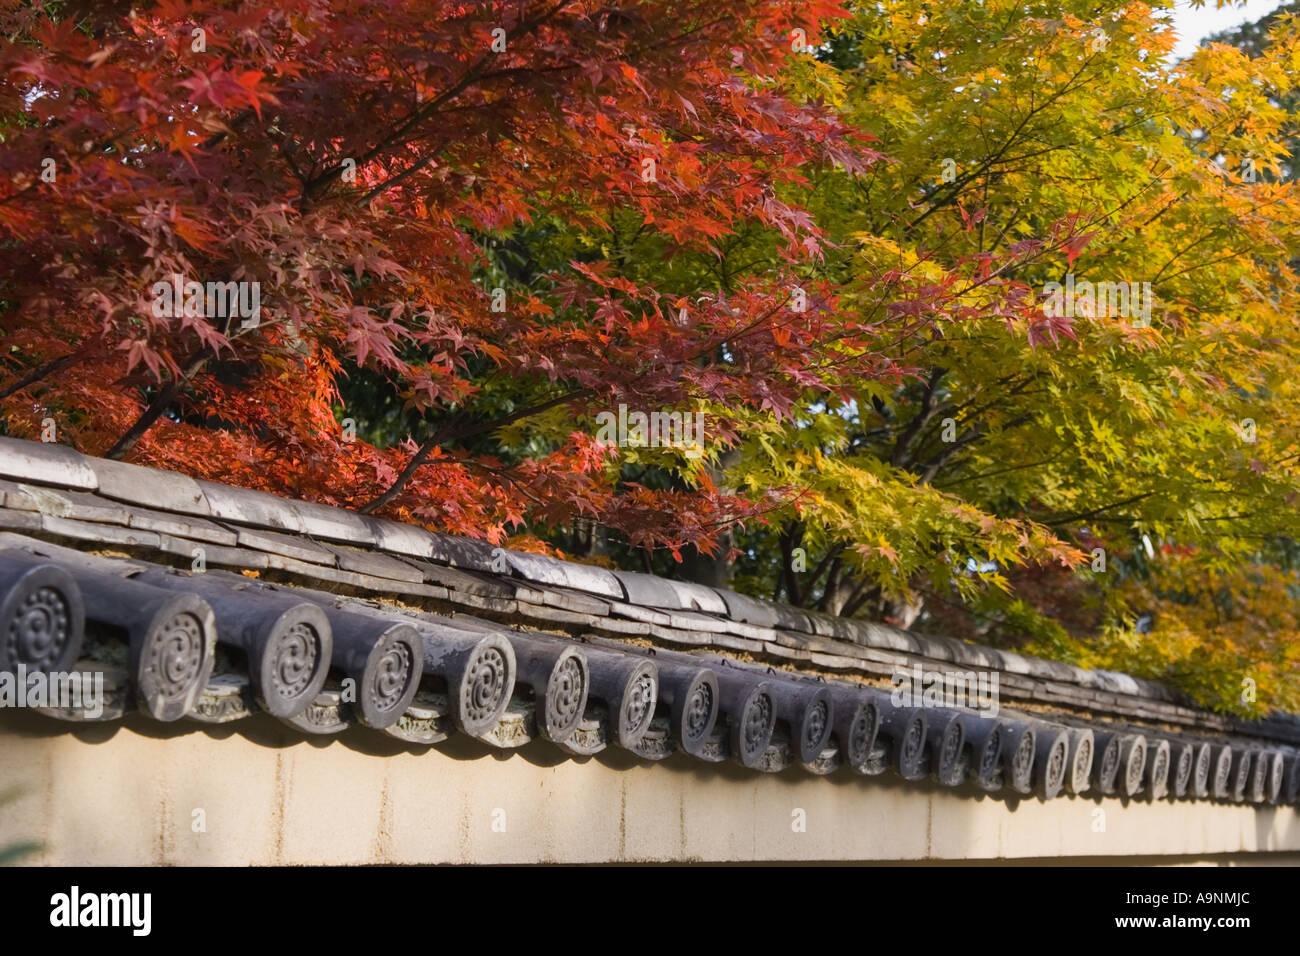 Japanese maple (Acer palmatum) during autumn and detail of wall at Daitokuji Temple, Kyoto, Kansai Region, Japan - Stock Image